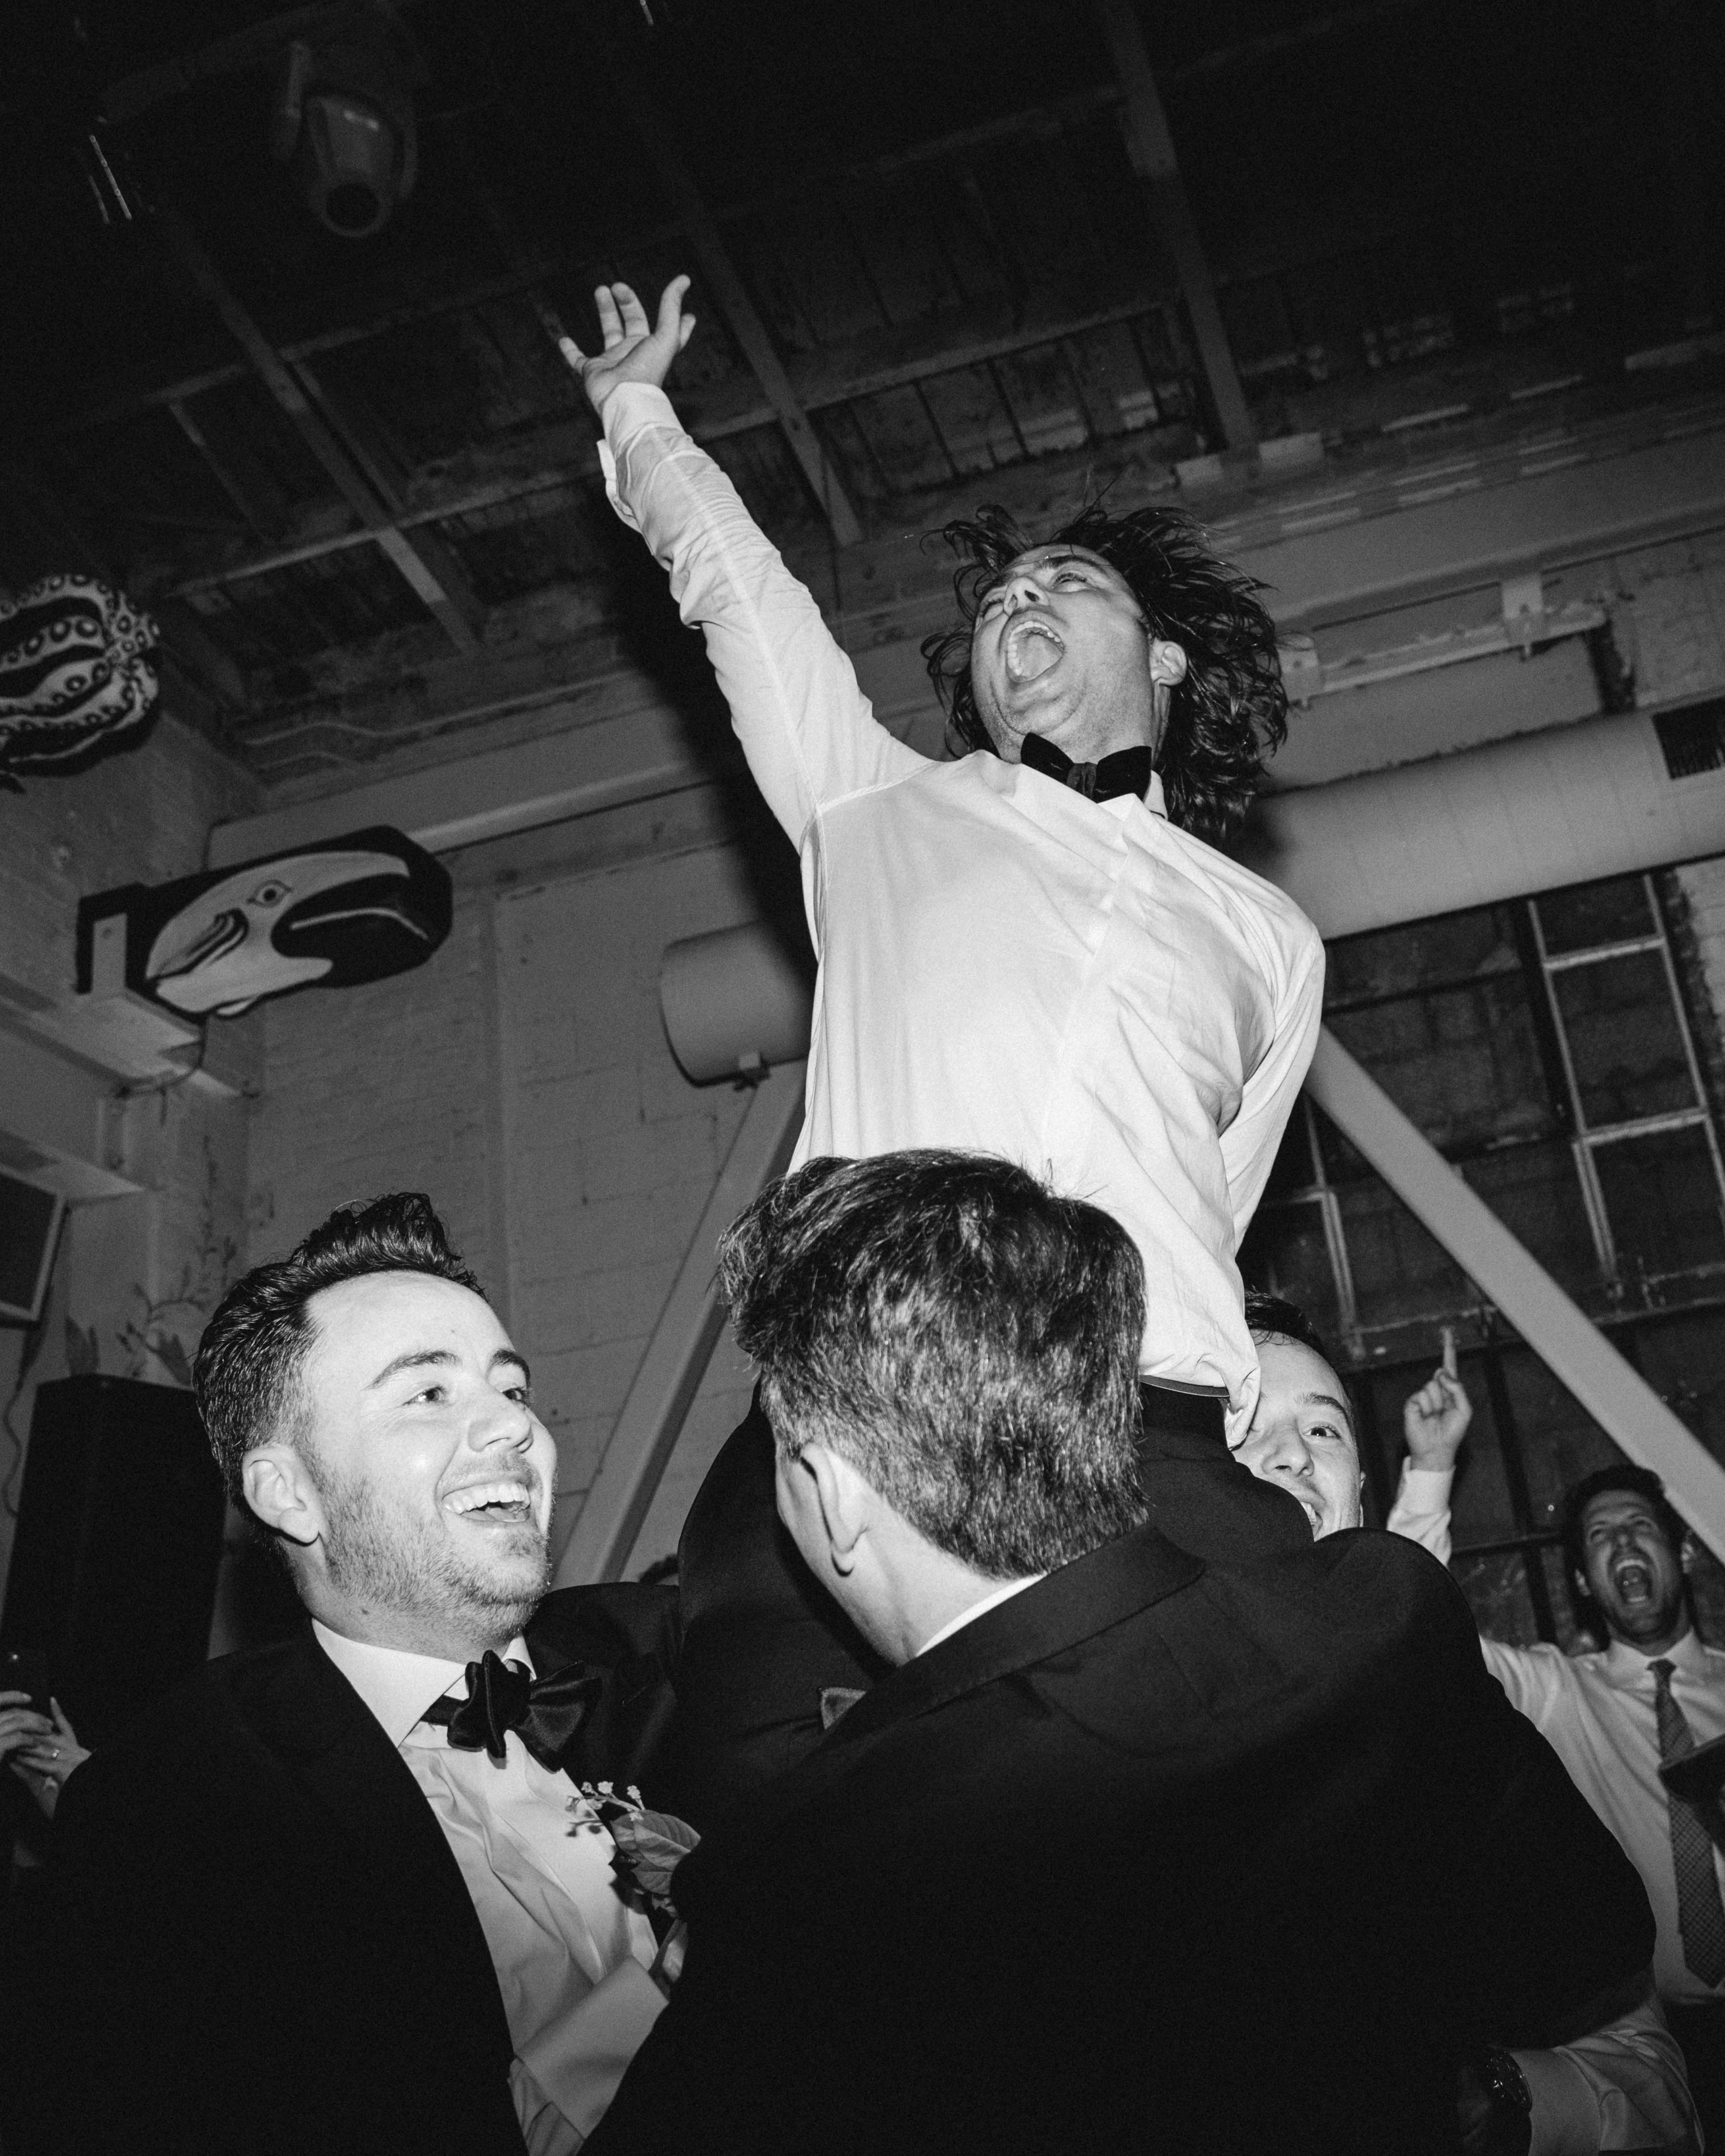 groom and groomsman dancing wedding reception